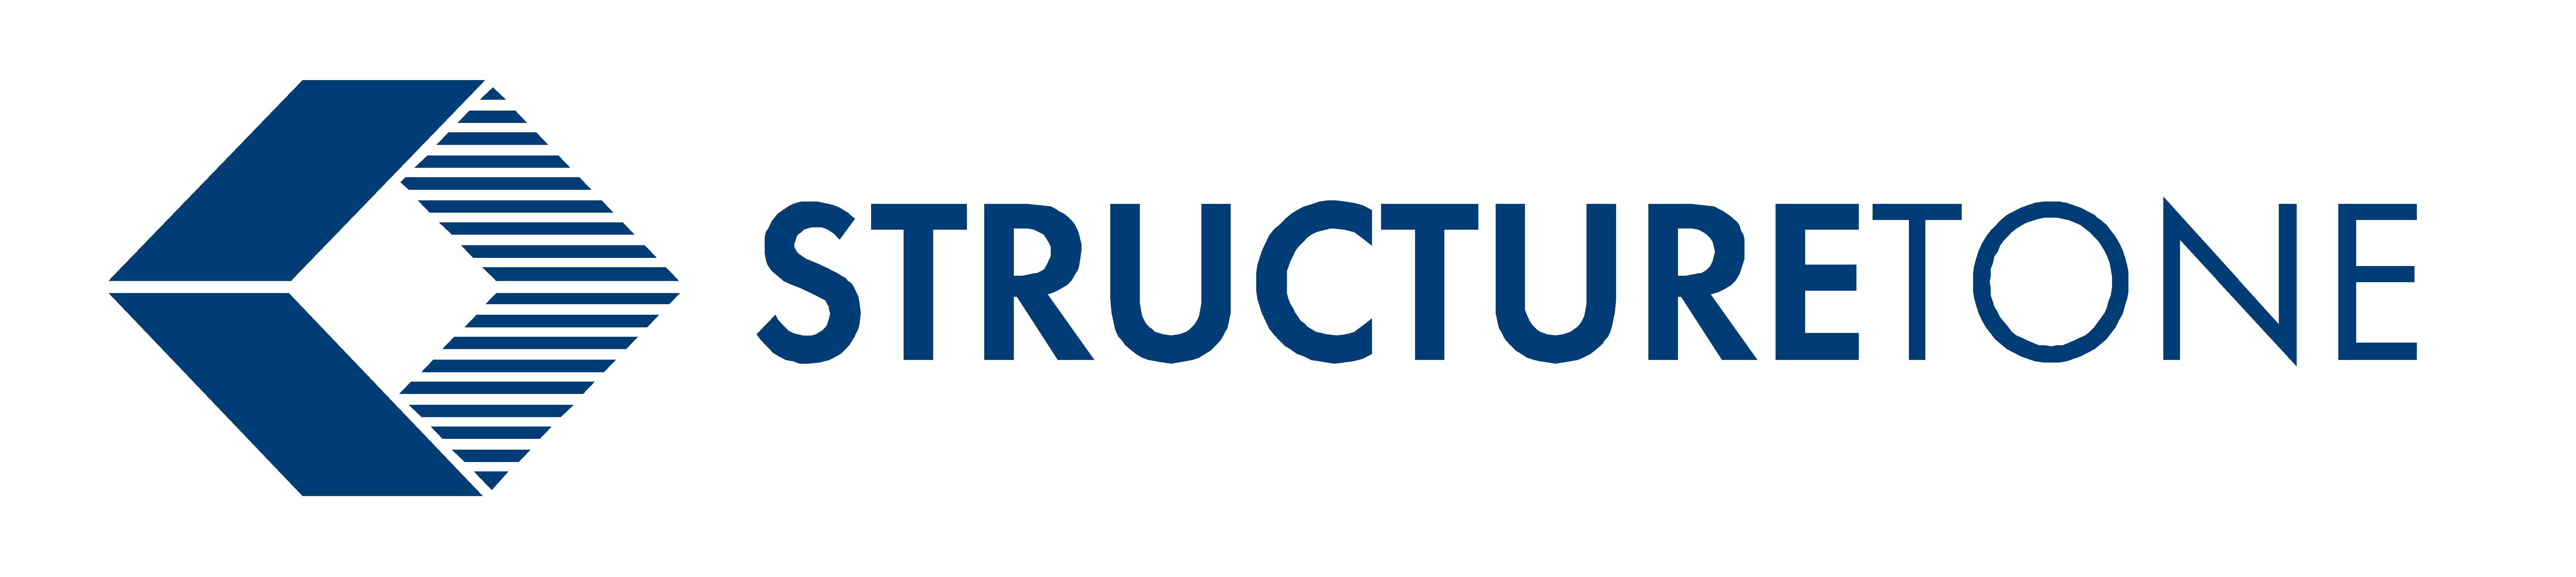 structuretonelogohighres construction industry federation